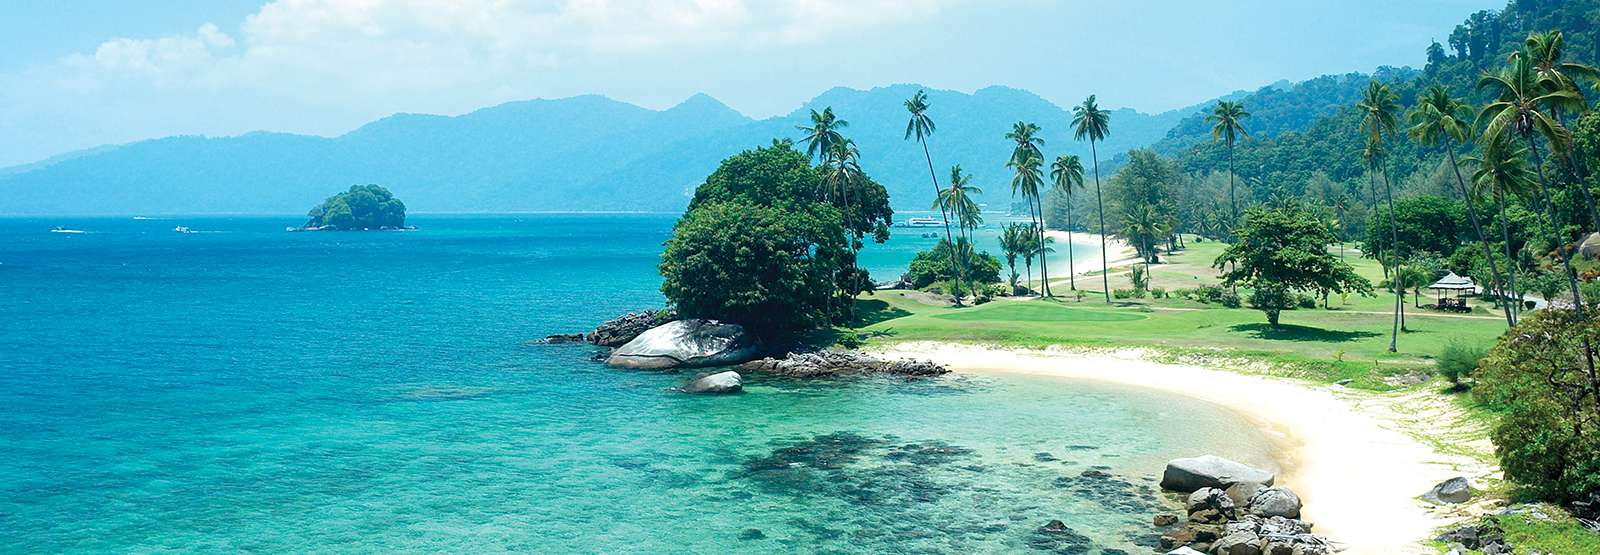 Island Resort For Sale Malaysia